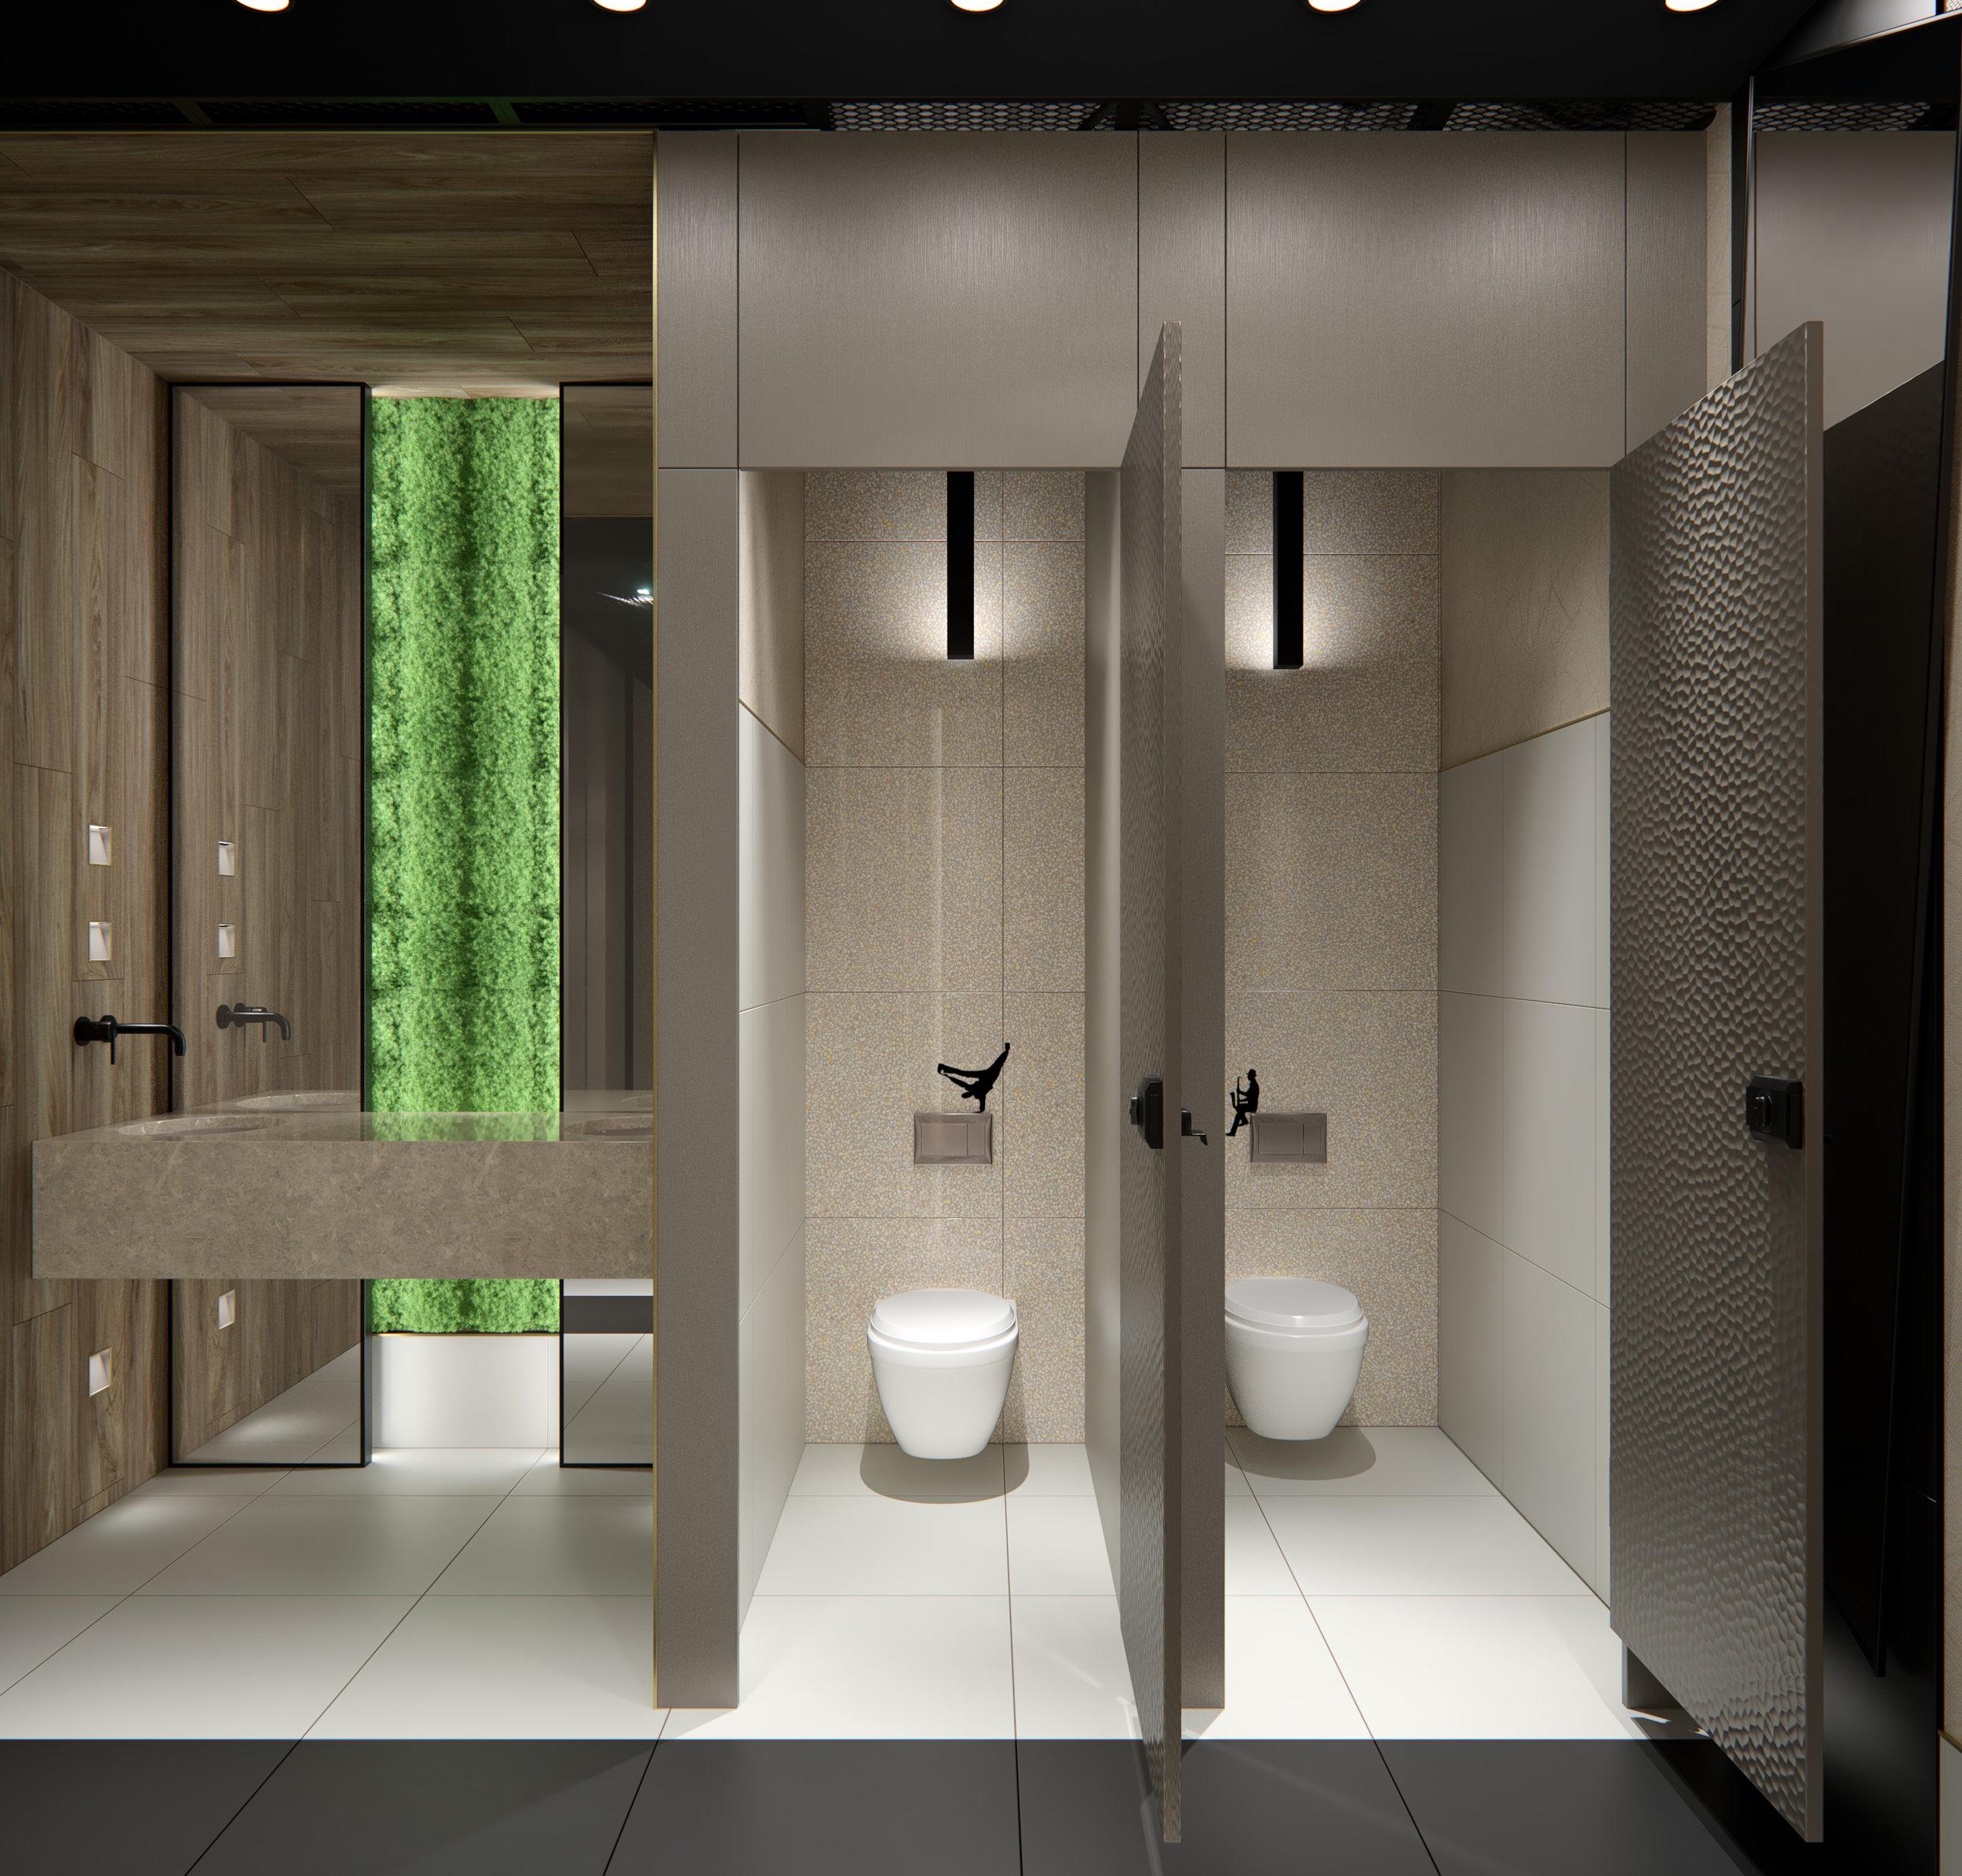 420 5TH AVENUE PUBLIC BATHROOM - MEN - 4.jpg